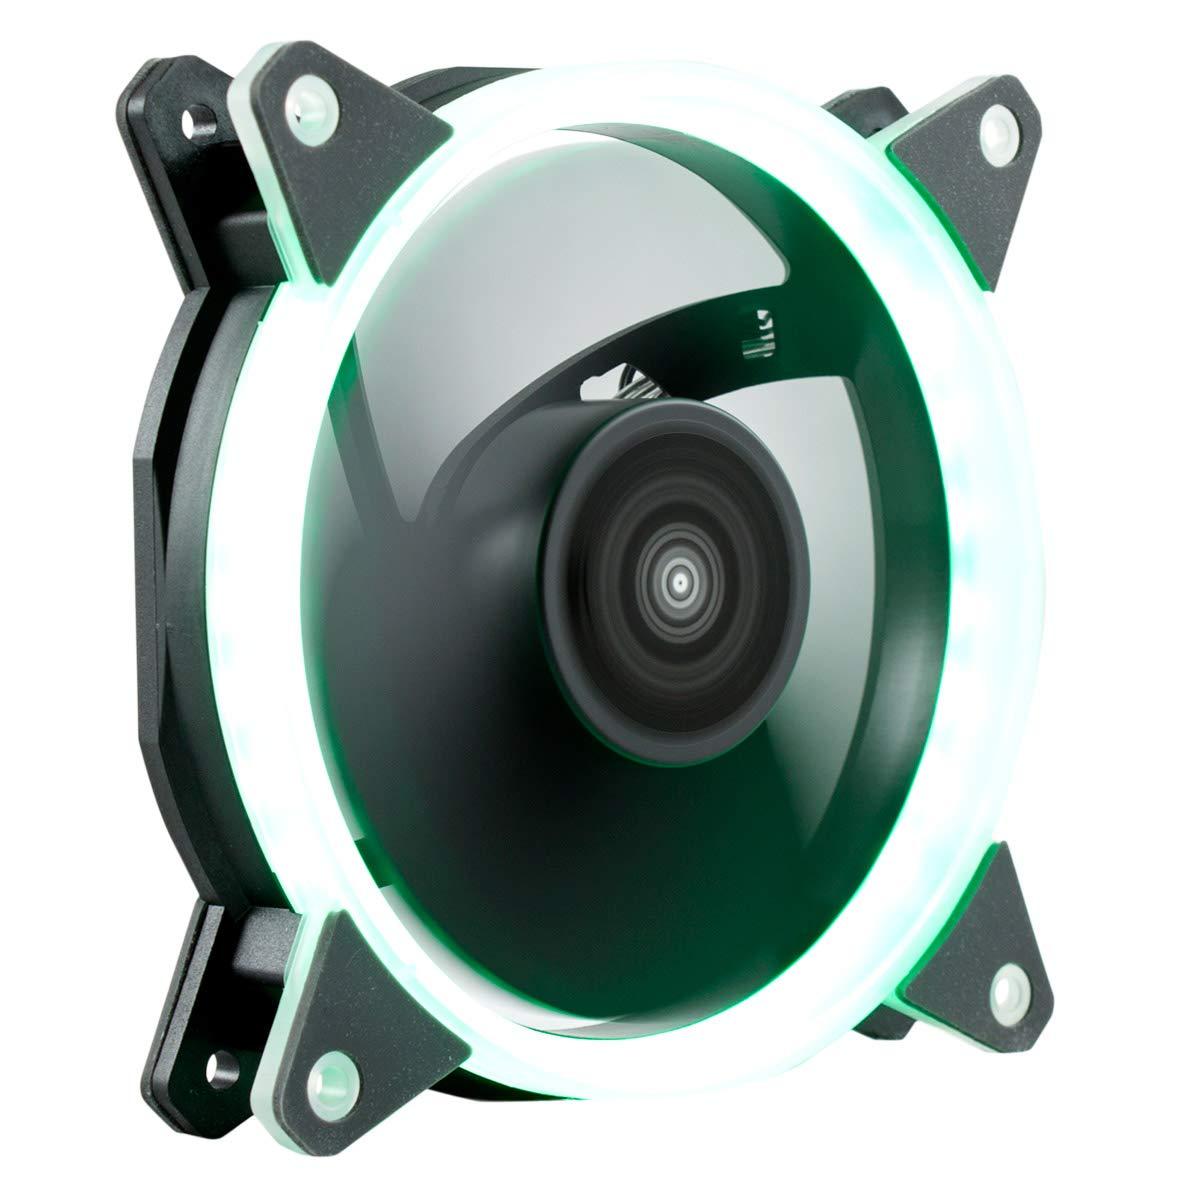 UNYKA GAMING Ventilador Caja Adicional Candy 20 Ring 120mm Verde